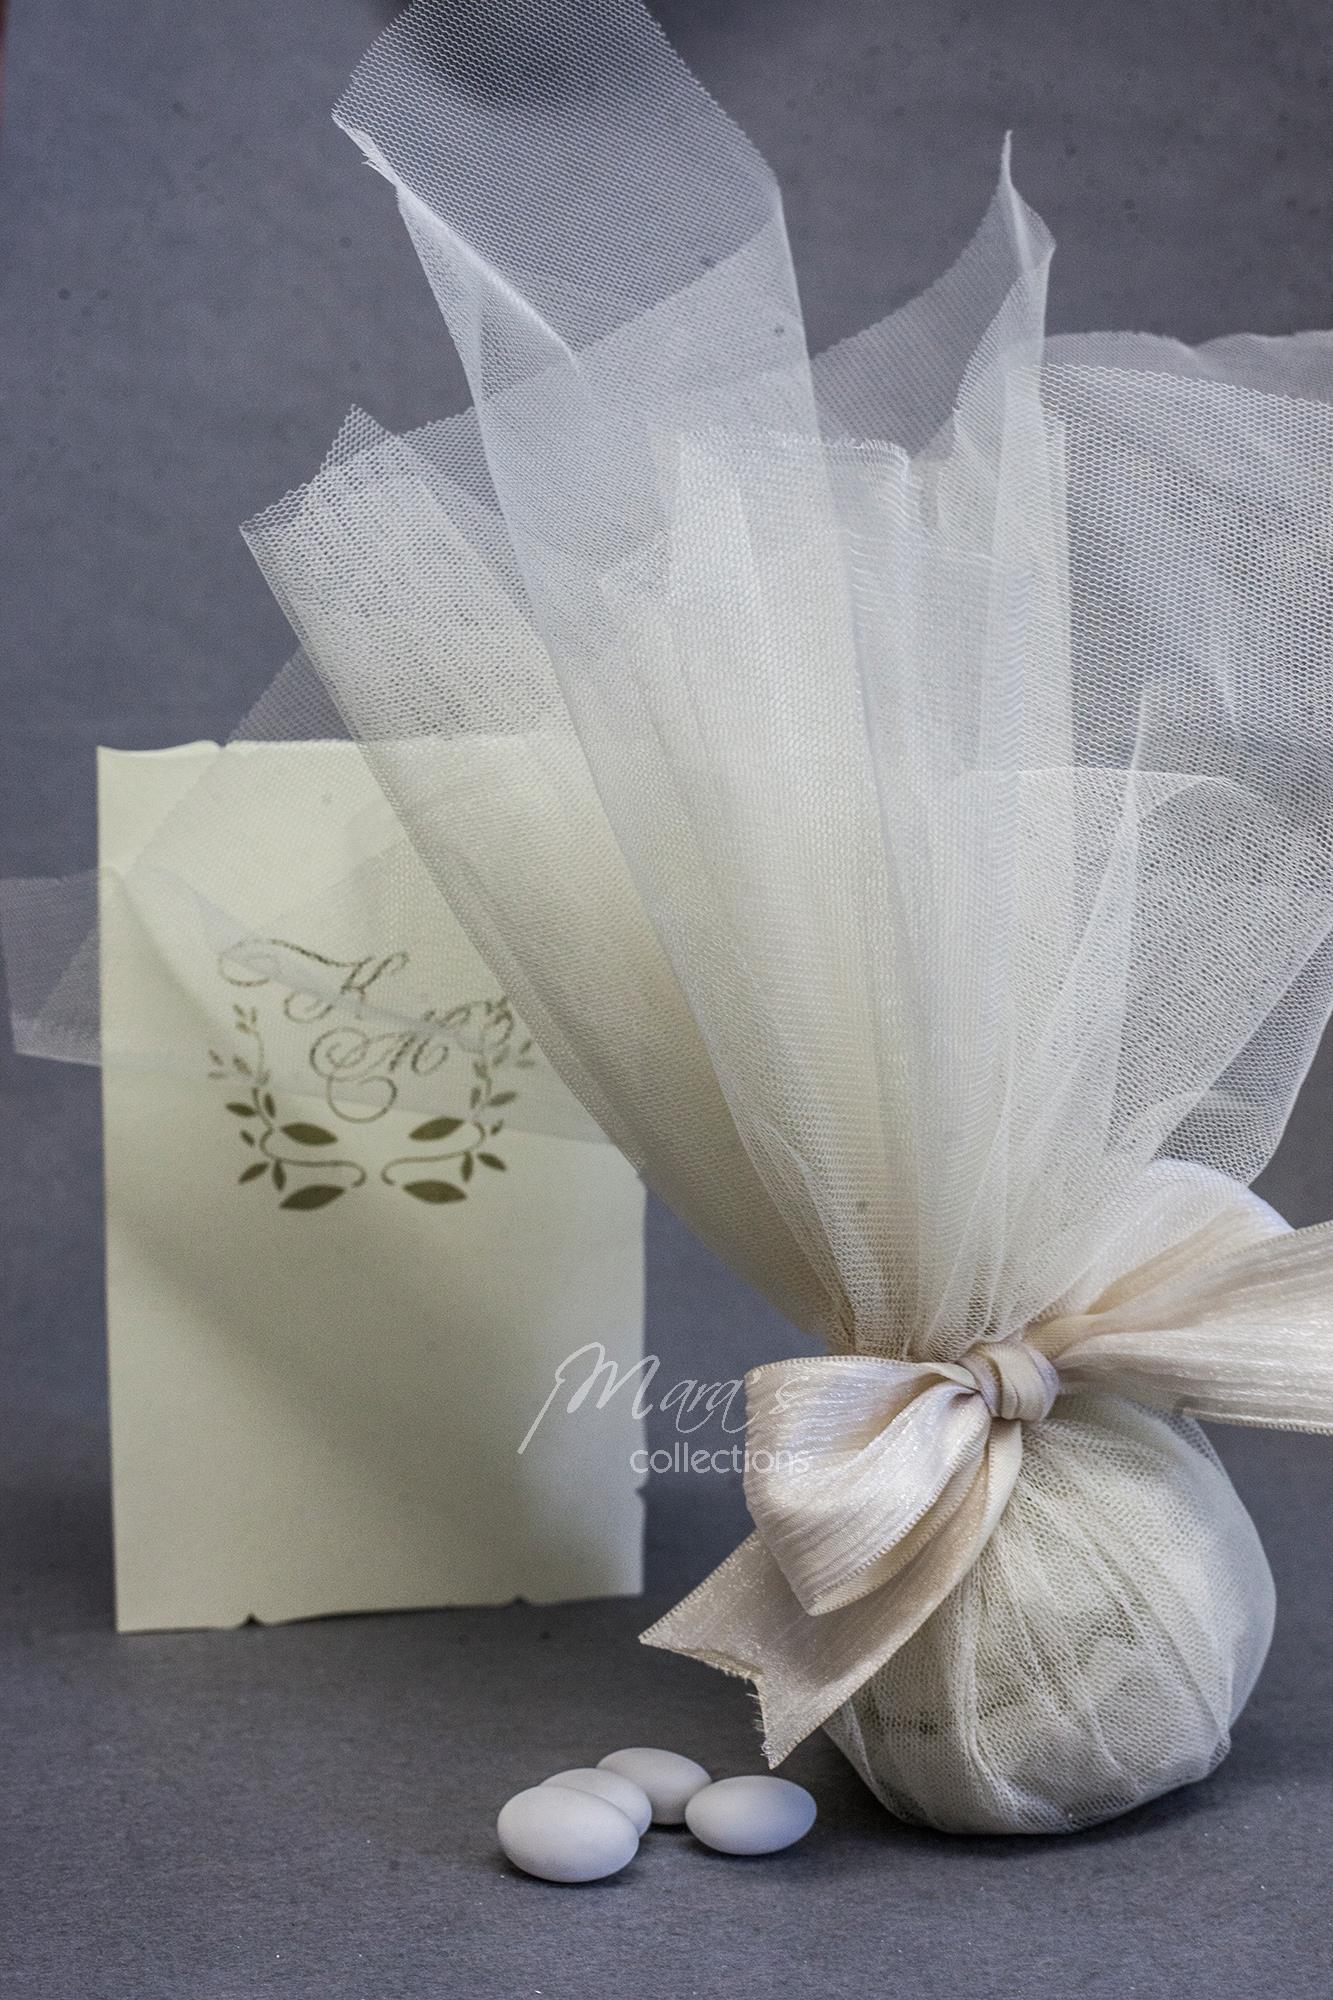 722229d03c2 Μπομπονιέρα γάμου τούλι εκρού και κορδέλα μπέζ